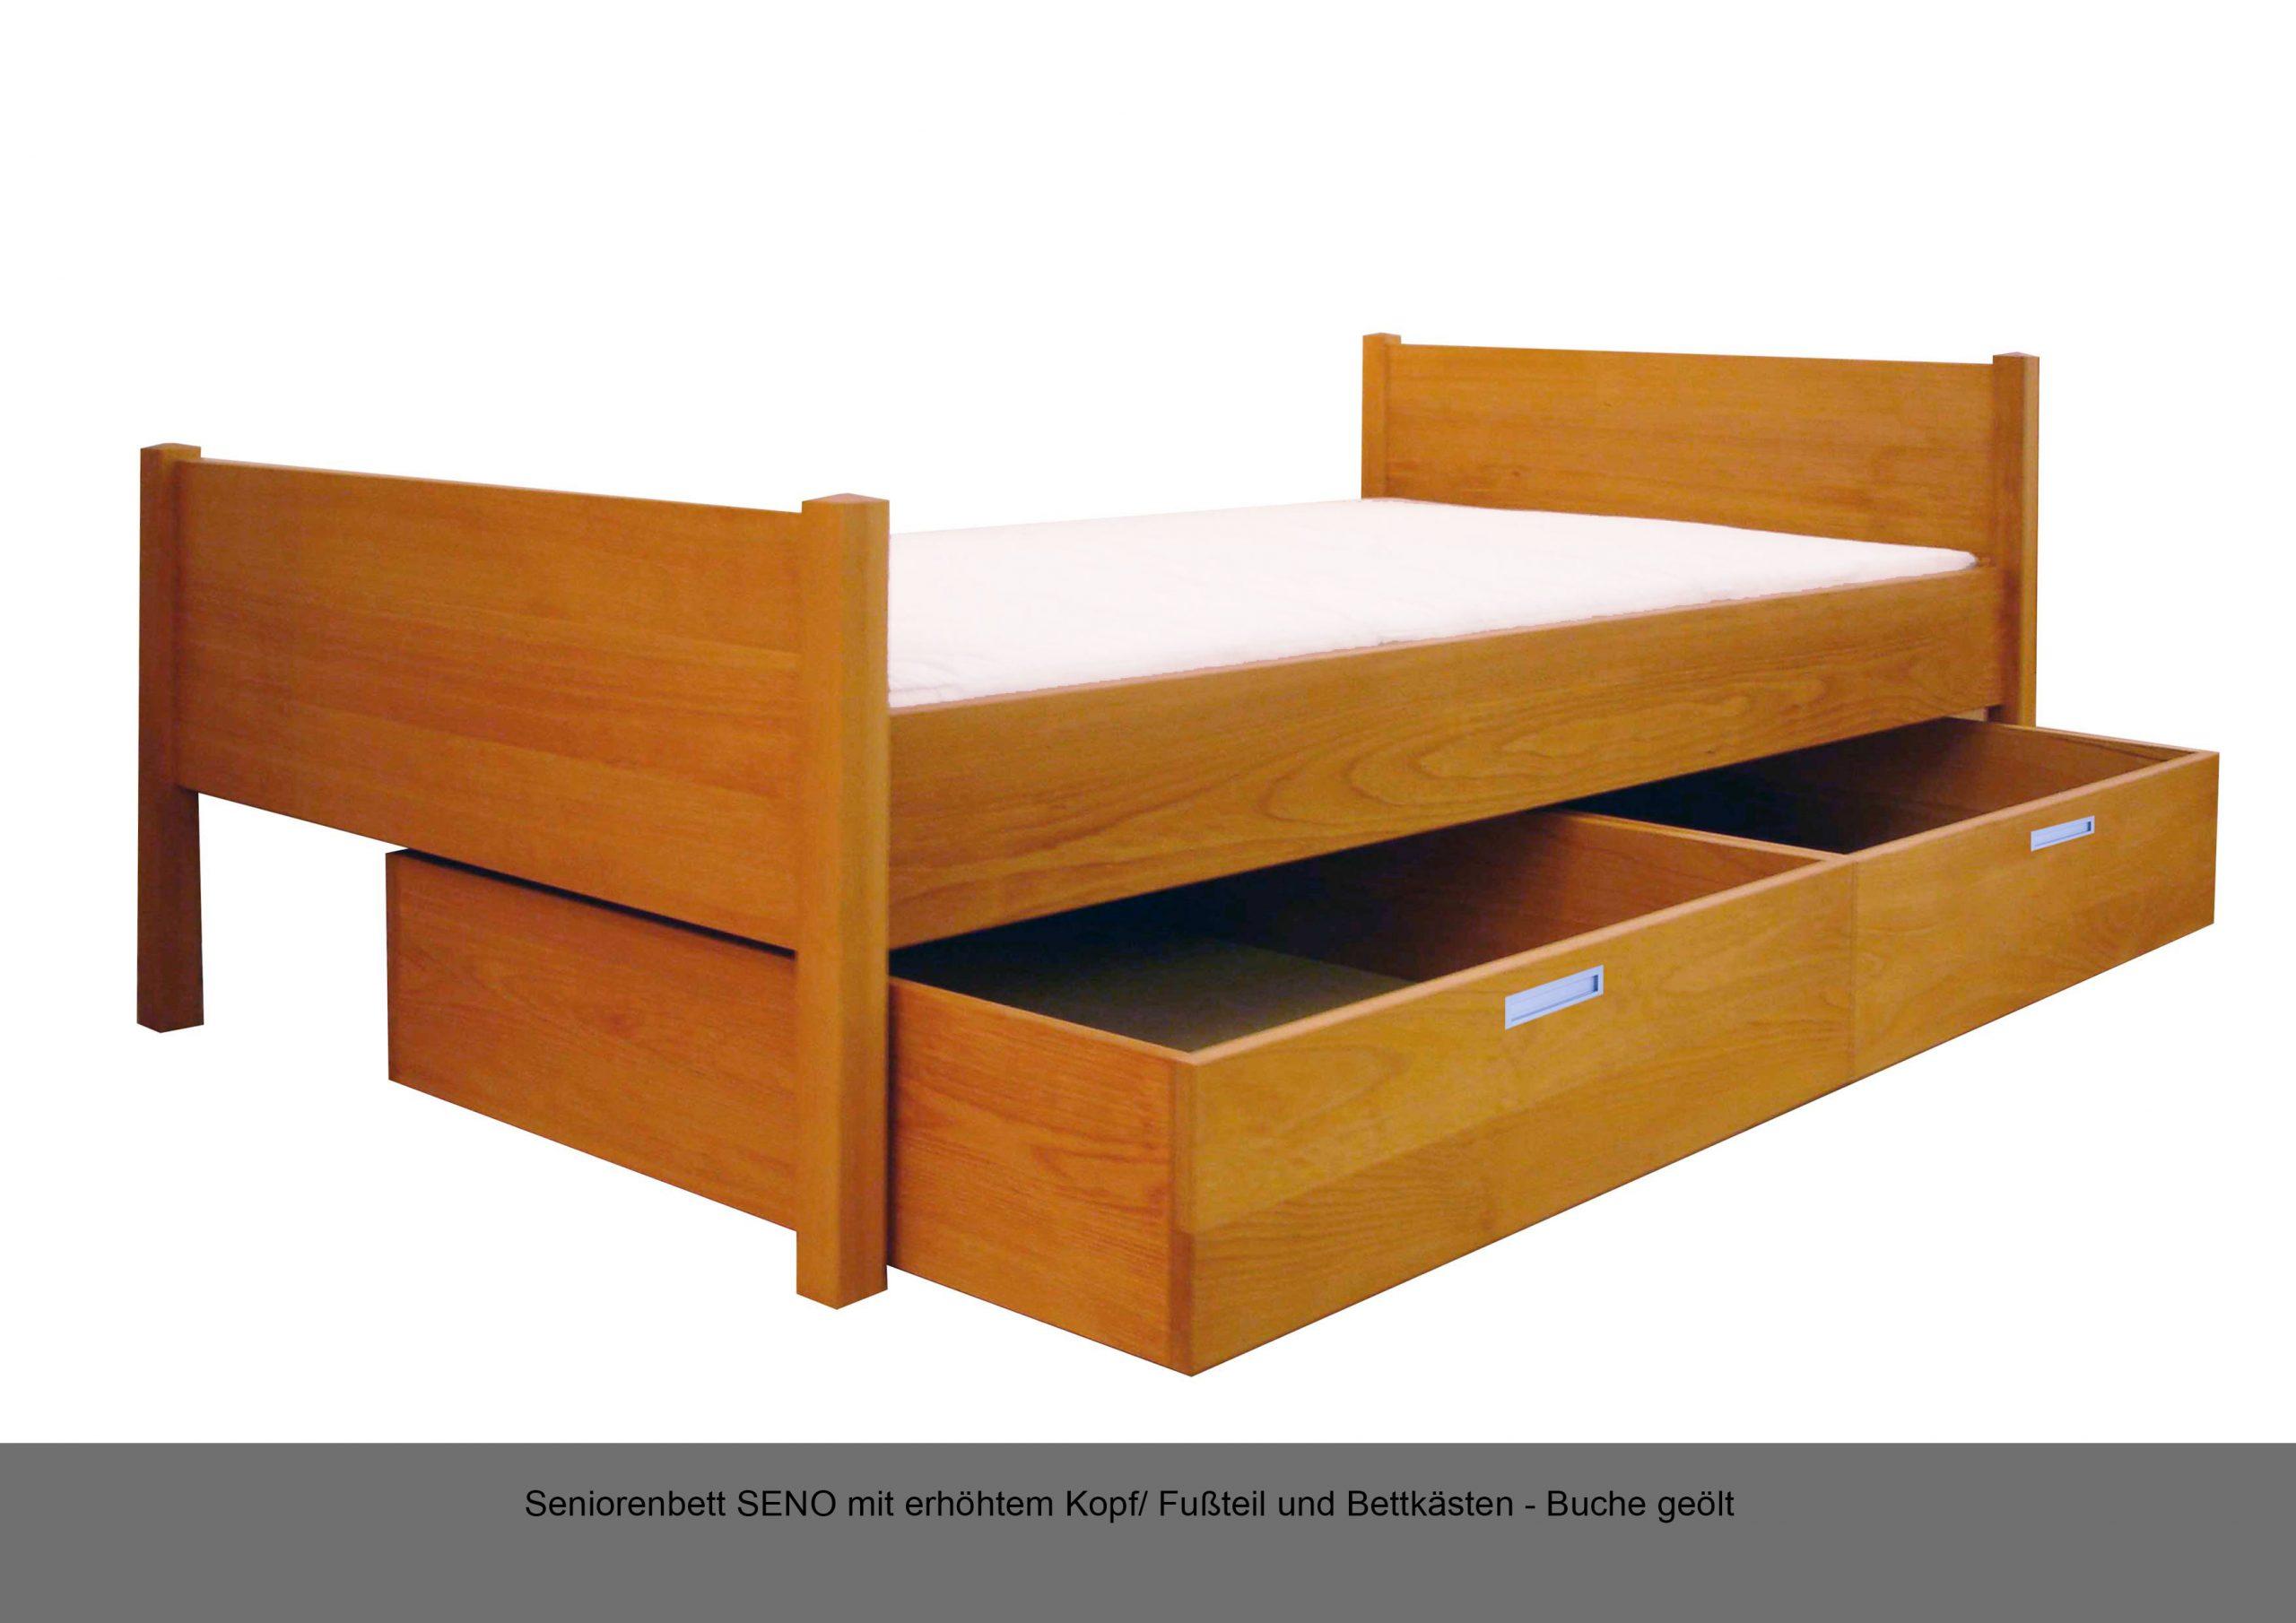 Seniorenbett Massivholz Bettkasten erhöht Fussteil Kopfteil SENO Buche geölt